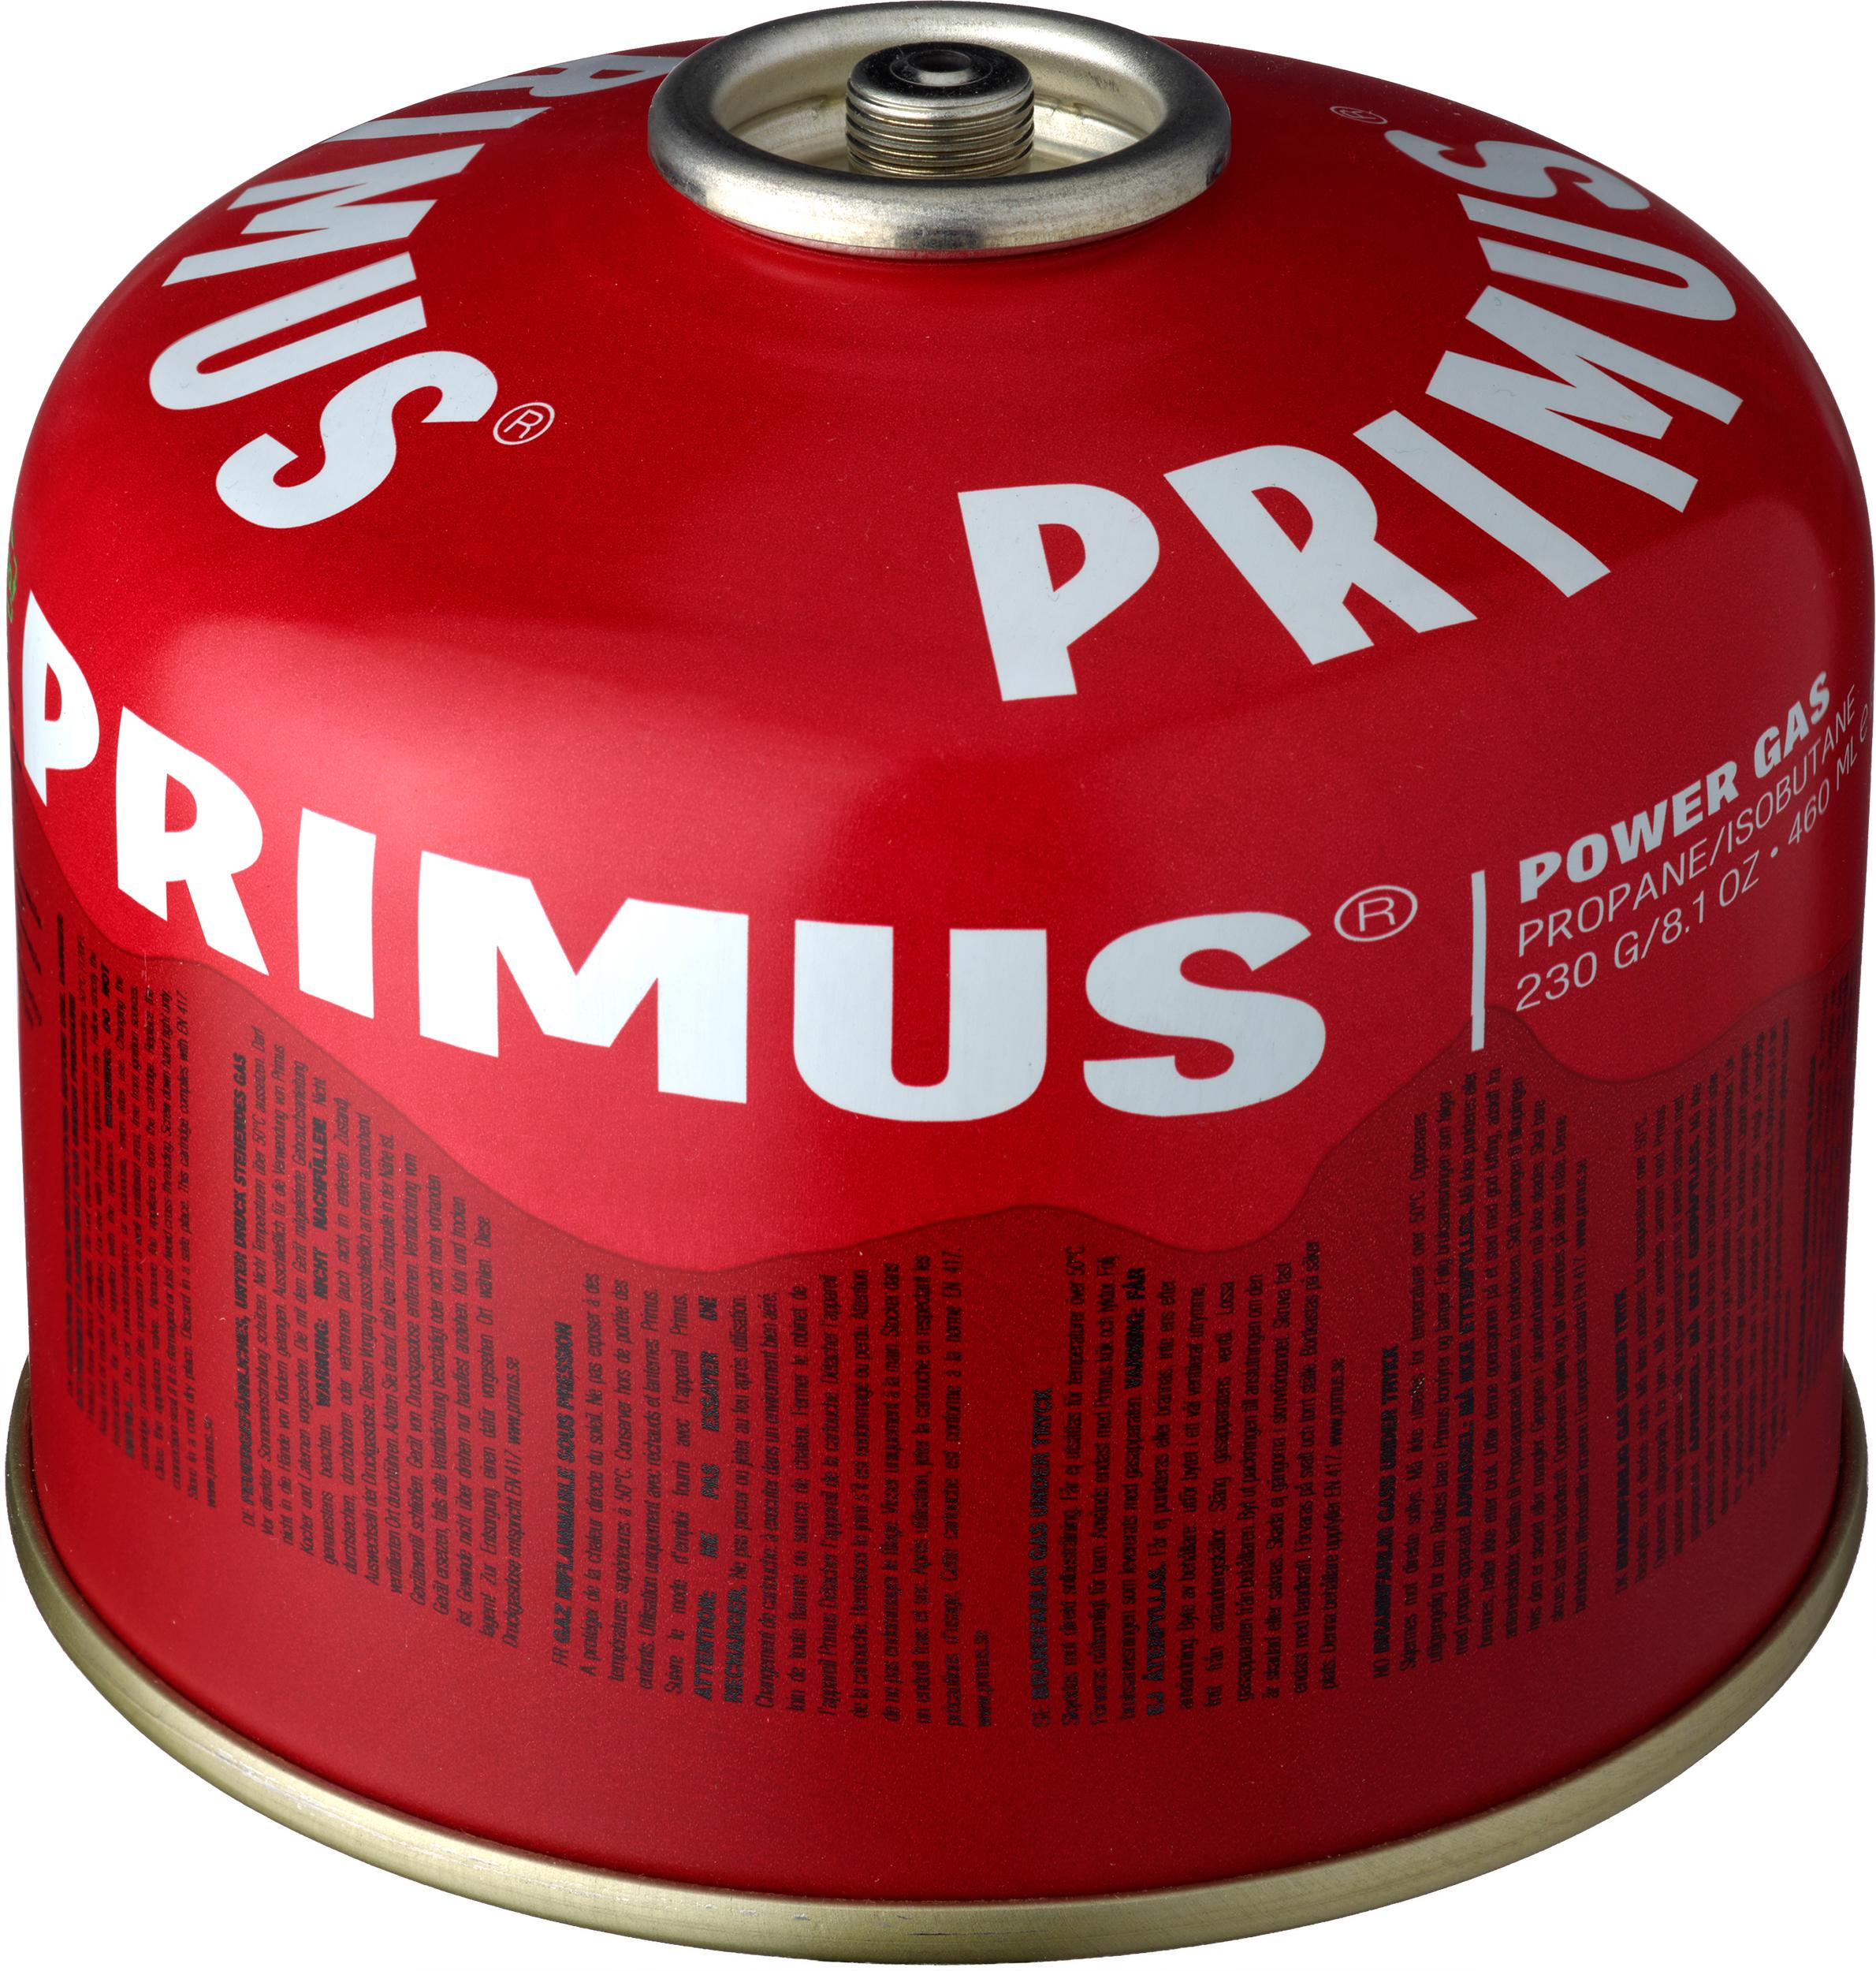 Primus 230 Butane/Propane Canister